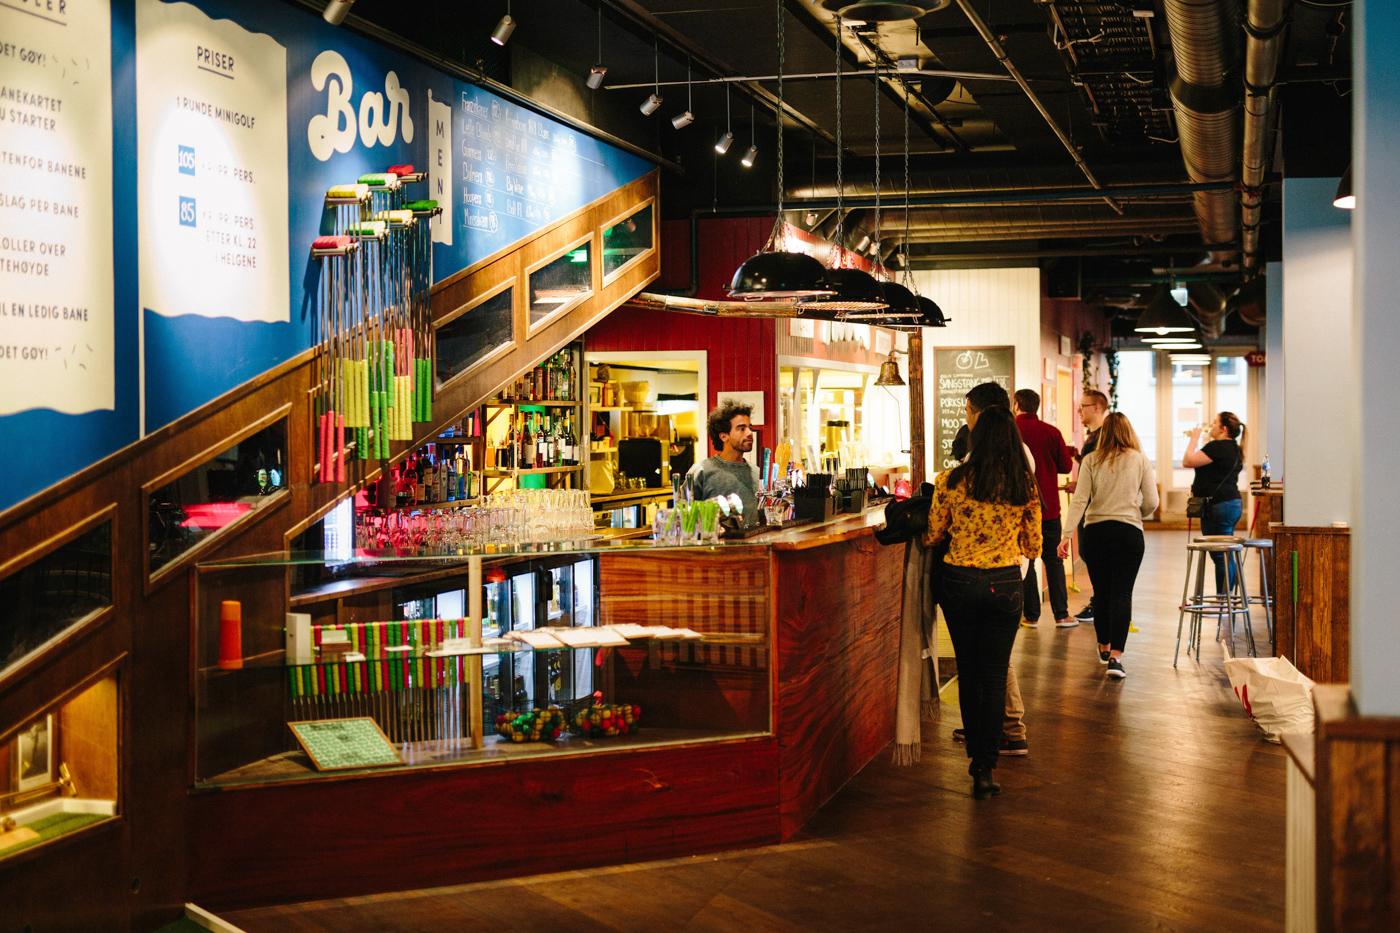 Bingo på minigolfbar: Vind golf, mad og fri bar for 5 personer